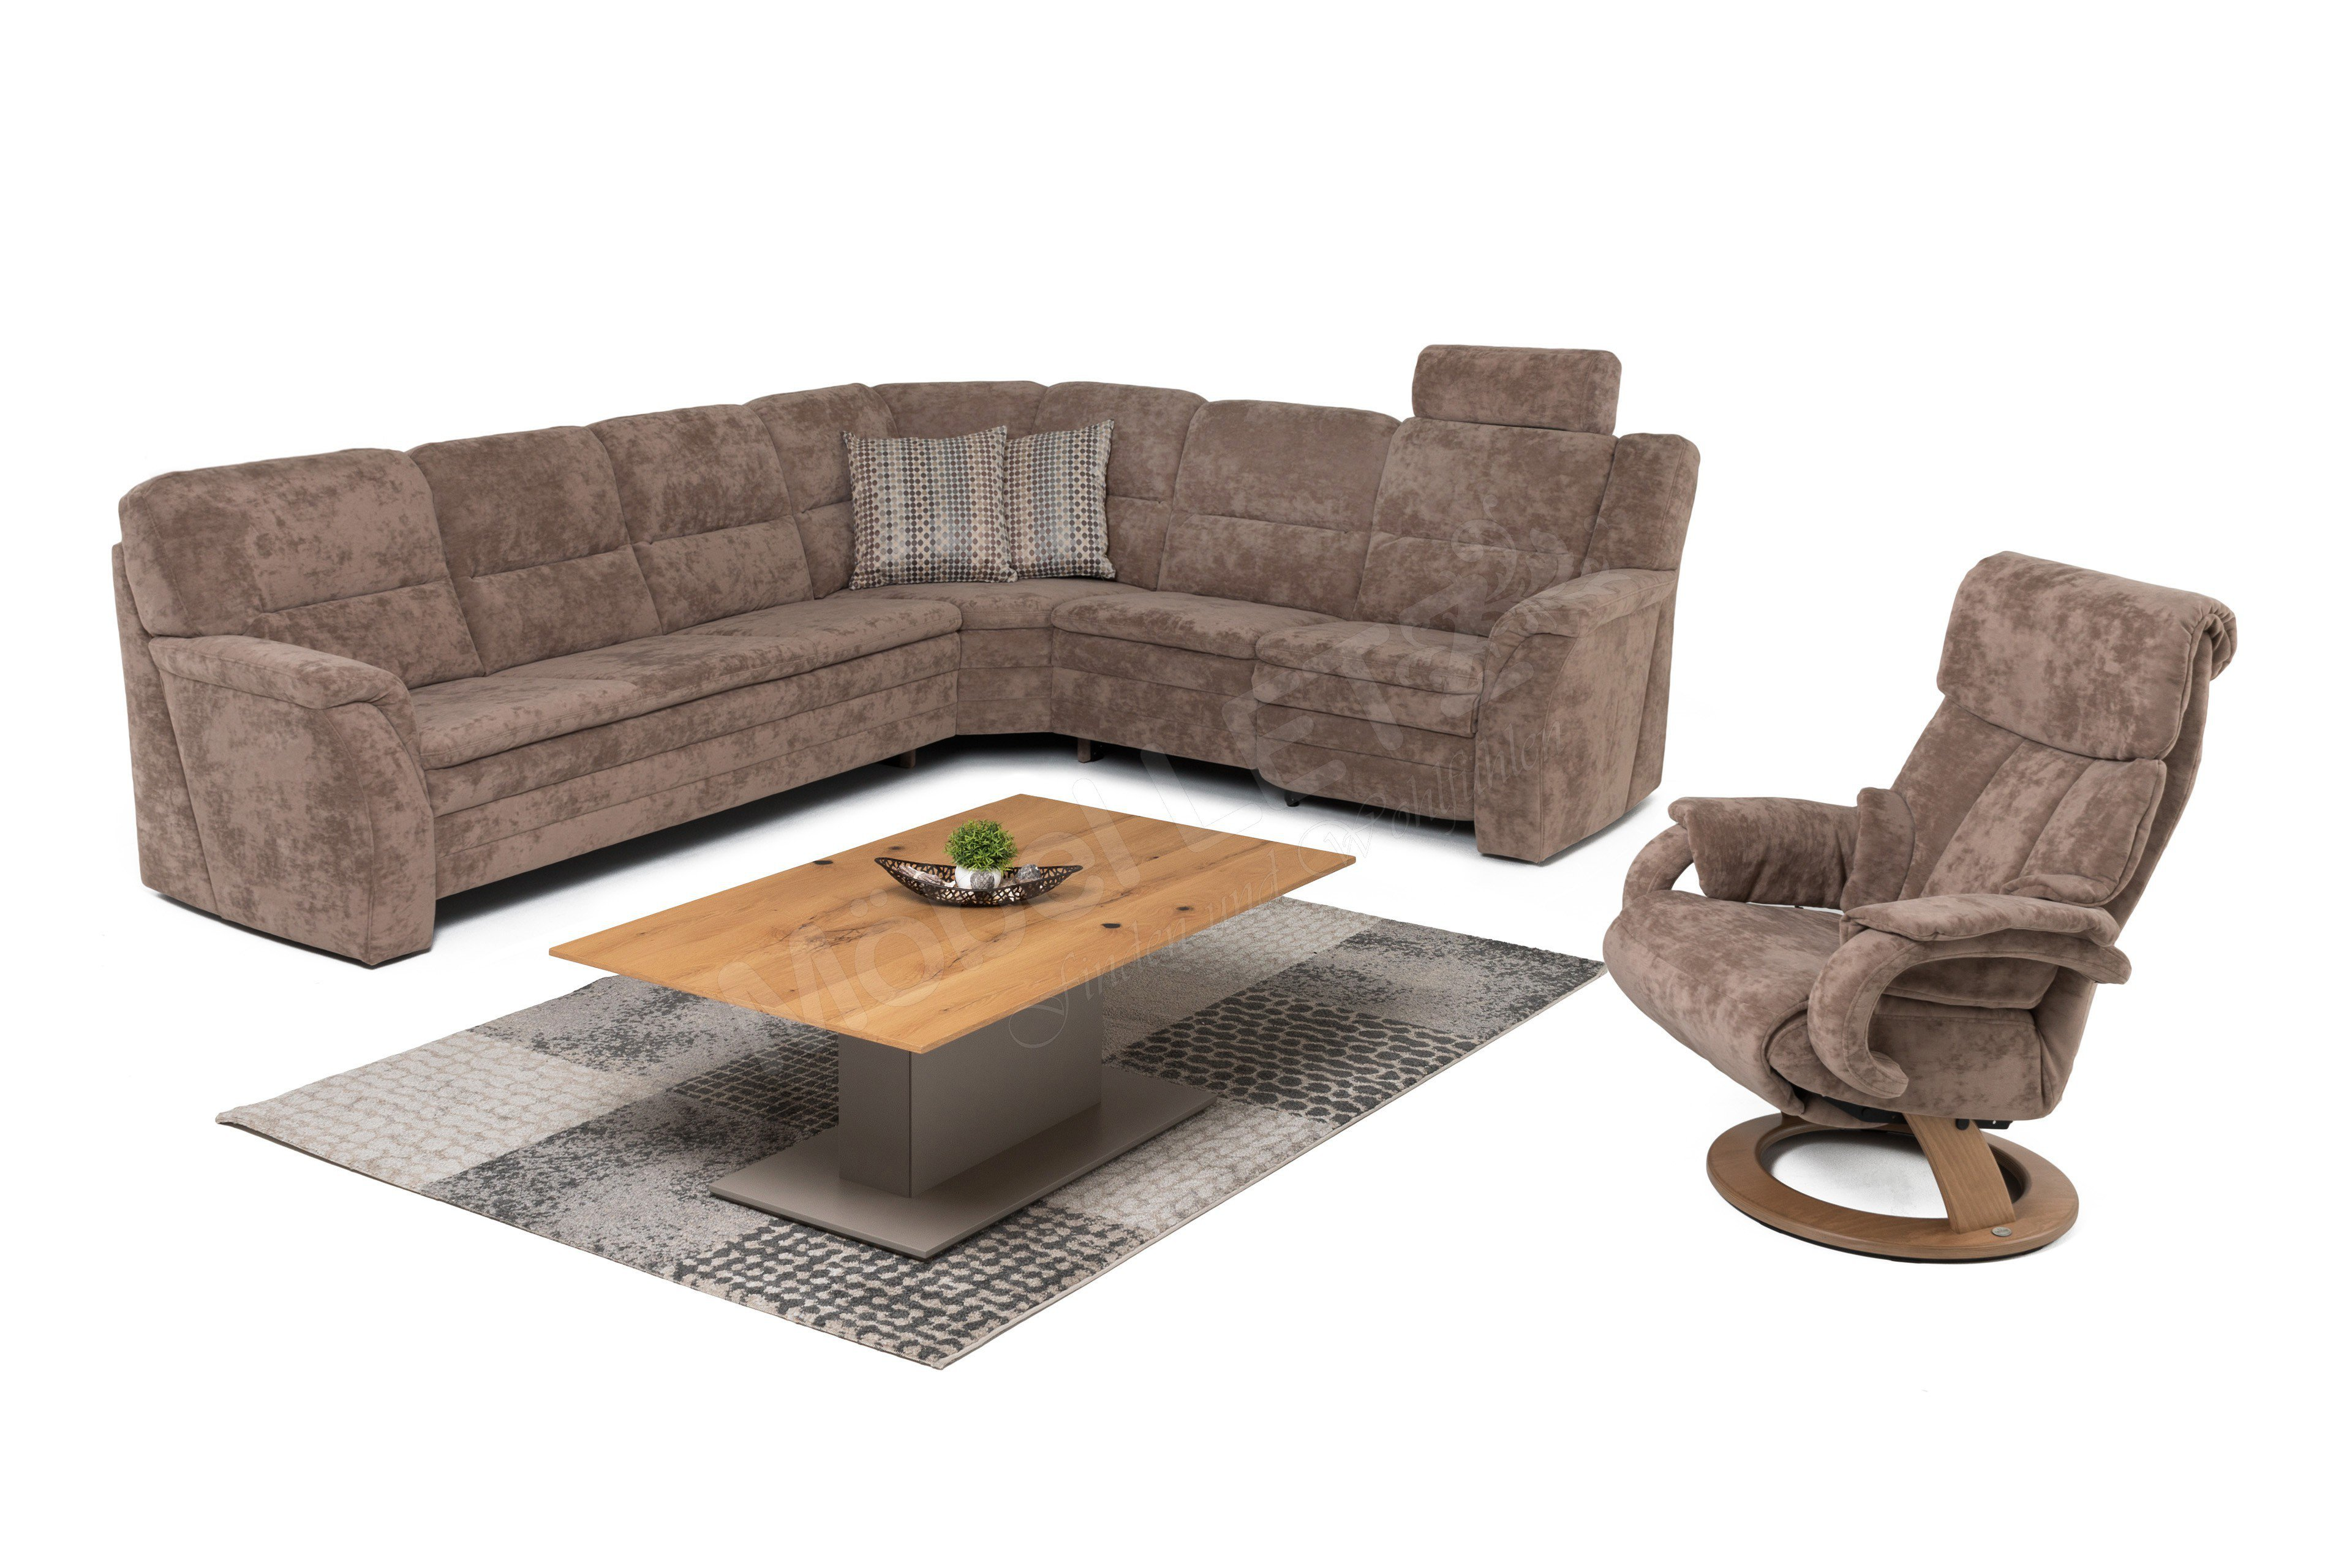 himolla polsterm bel 1102 polstergarnitur in braun m bel letz ihr online shop. Black Bedroom Furniture Sets. Home Design Ideas